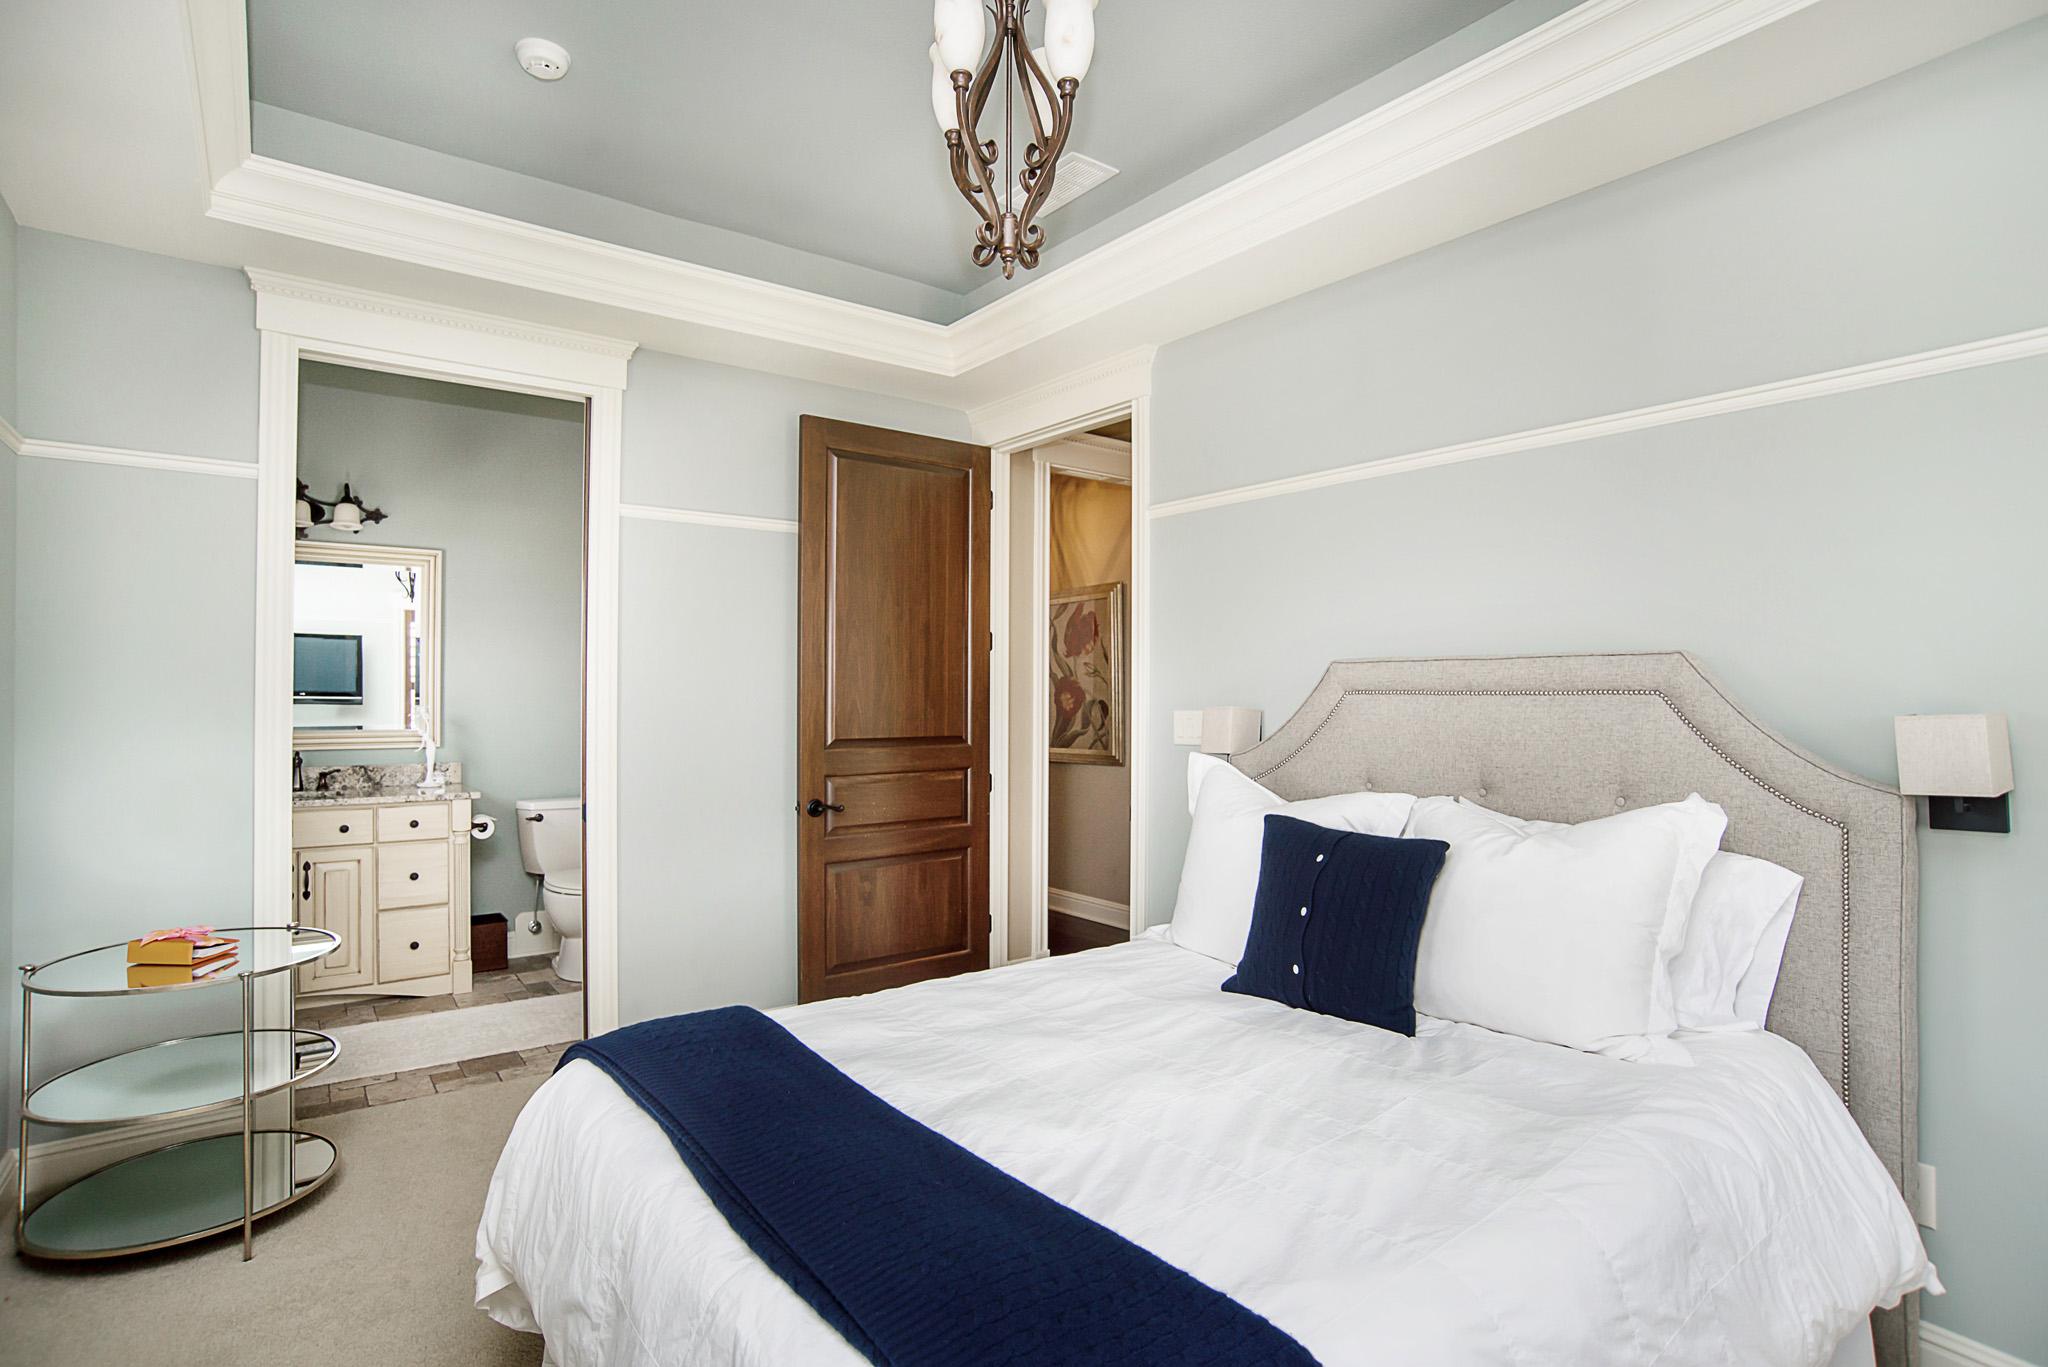 40-Bedroom 3.jpg